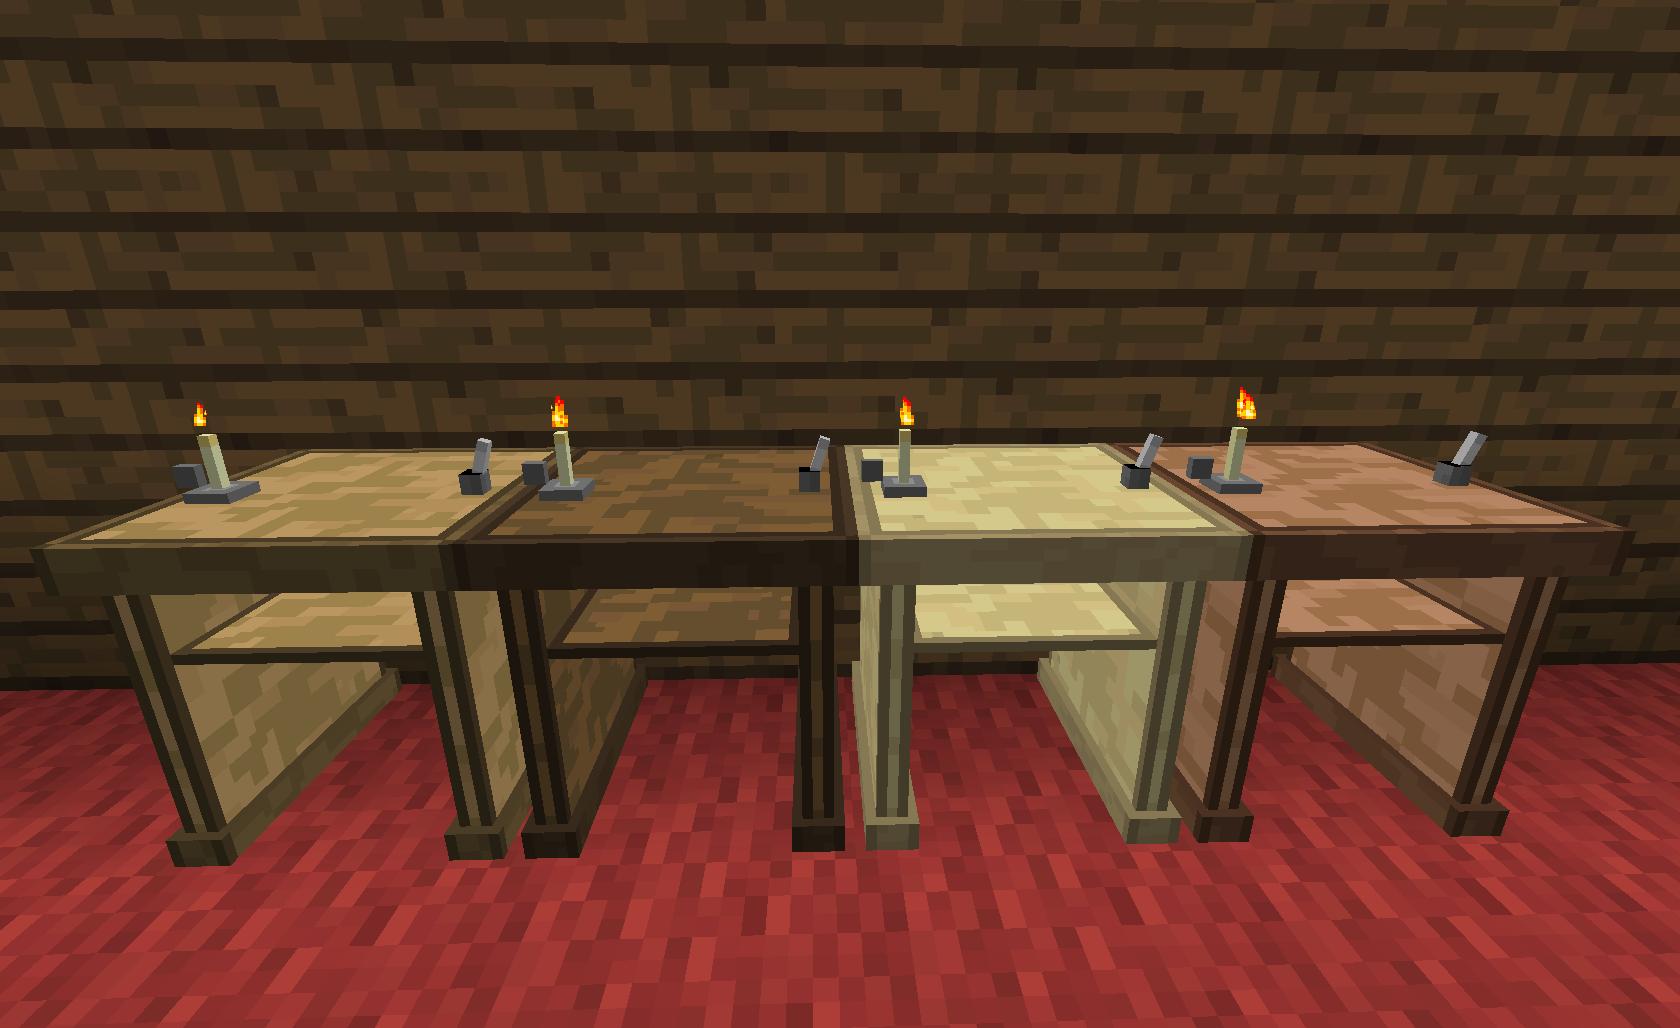 minecraft mod minecraft bibliocraft. Black Bedroom Furniture Sets. Home Design Ideas